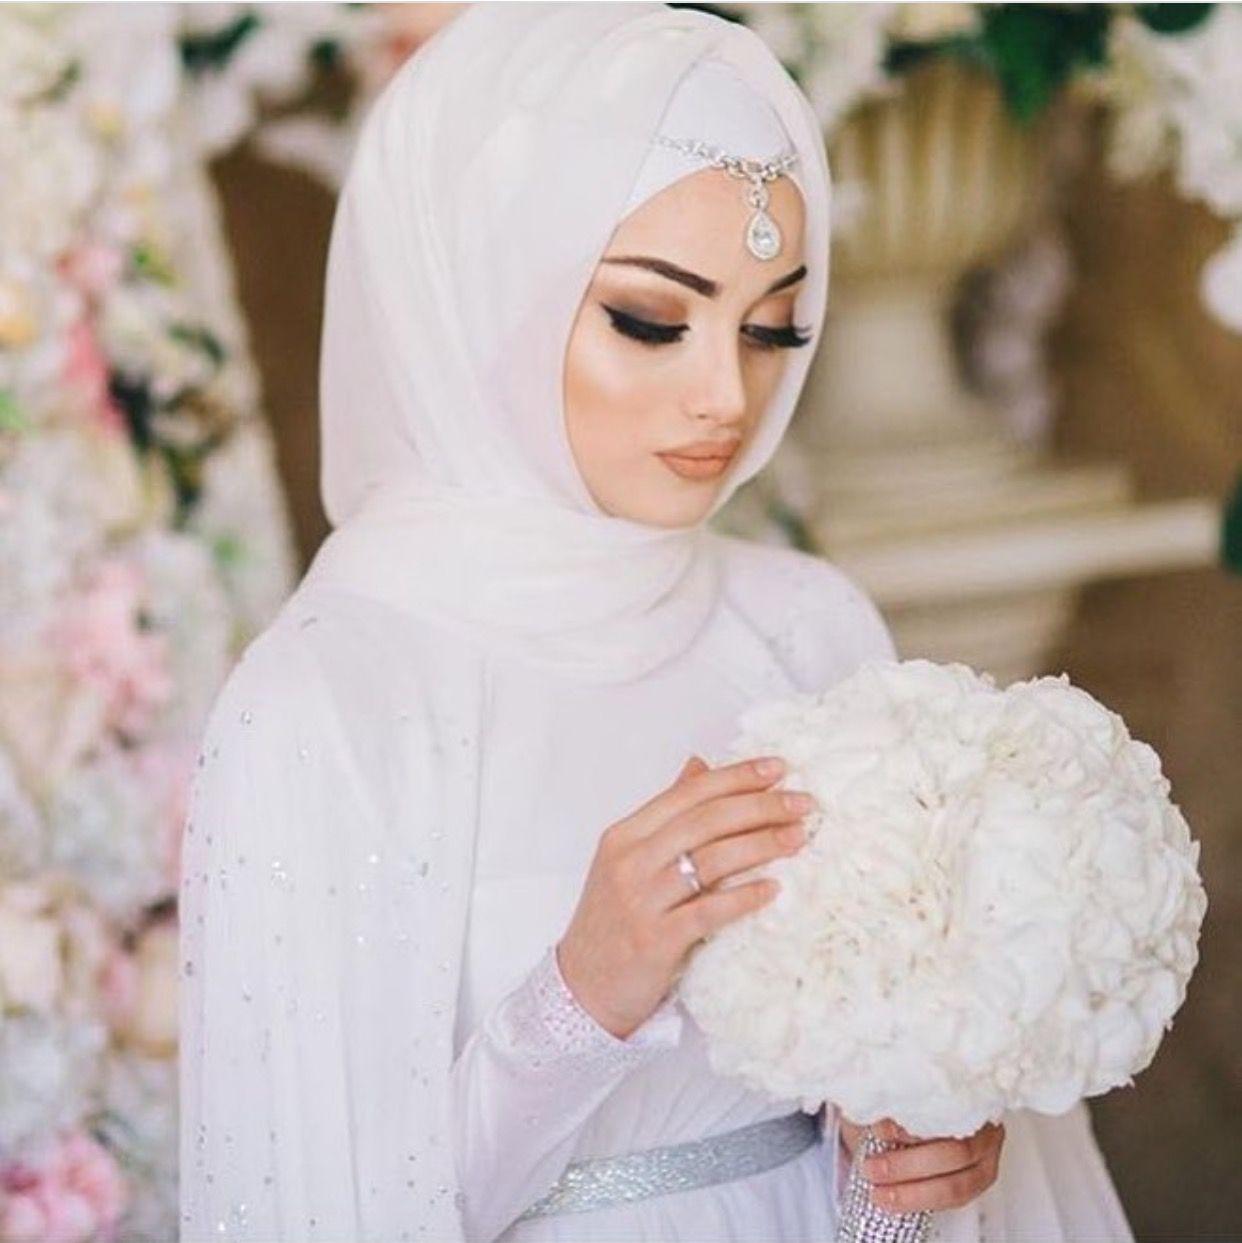 Pin by sita sediqi on hijab pinterest muslim wedding dress and